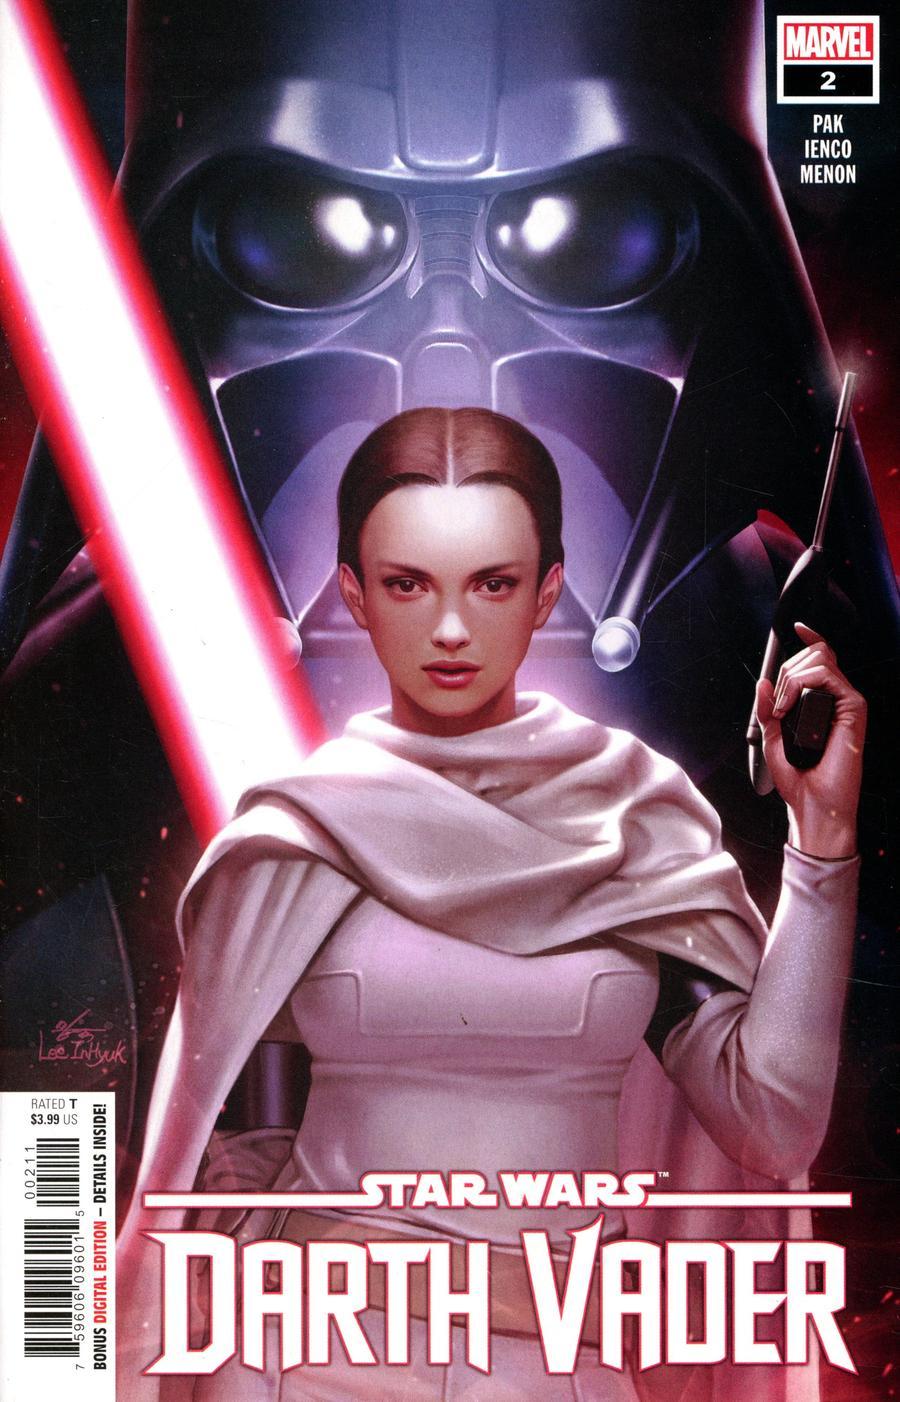 Star Wars Darth Vader #2 Cover A 1st Ptg Regular Inhyuk Lee Cover